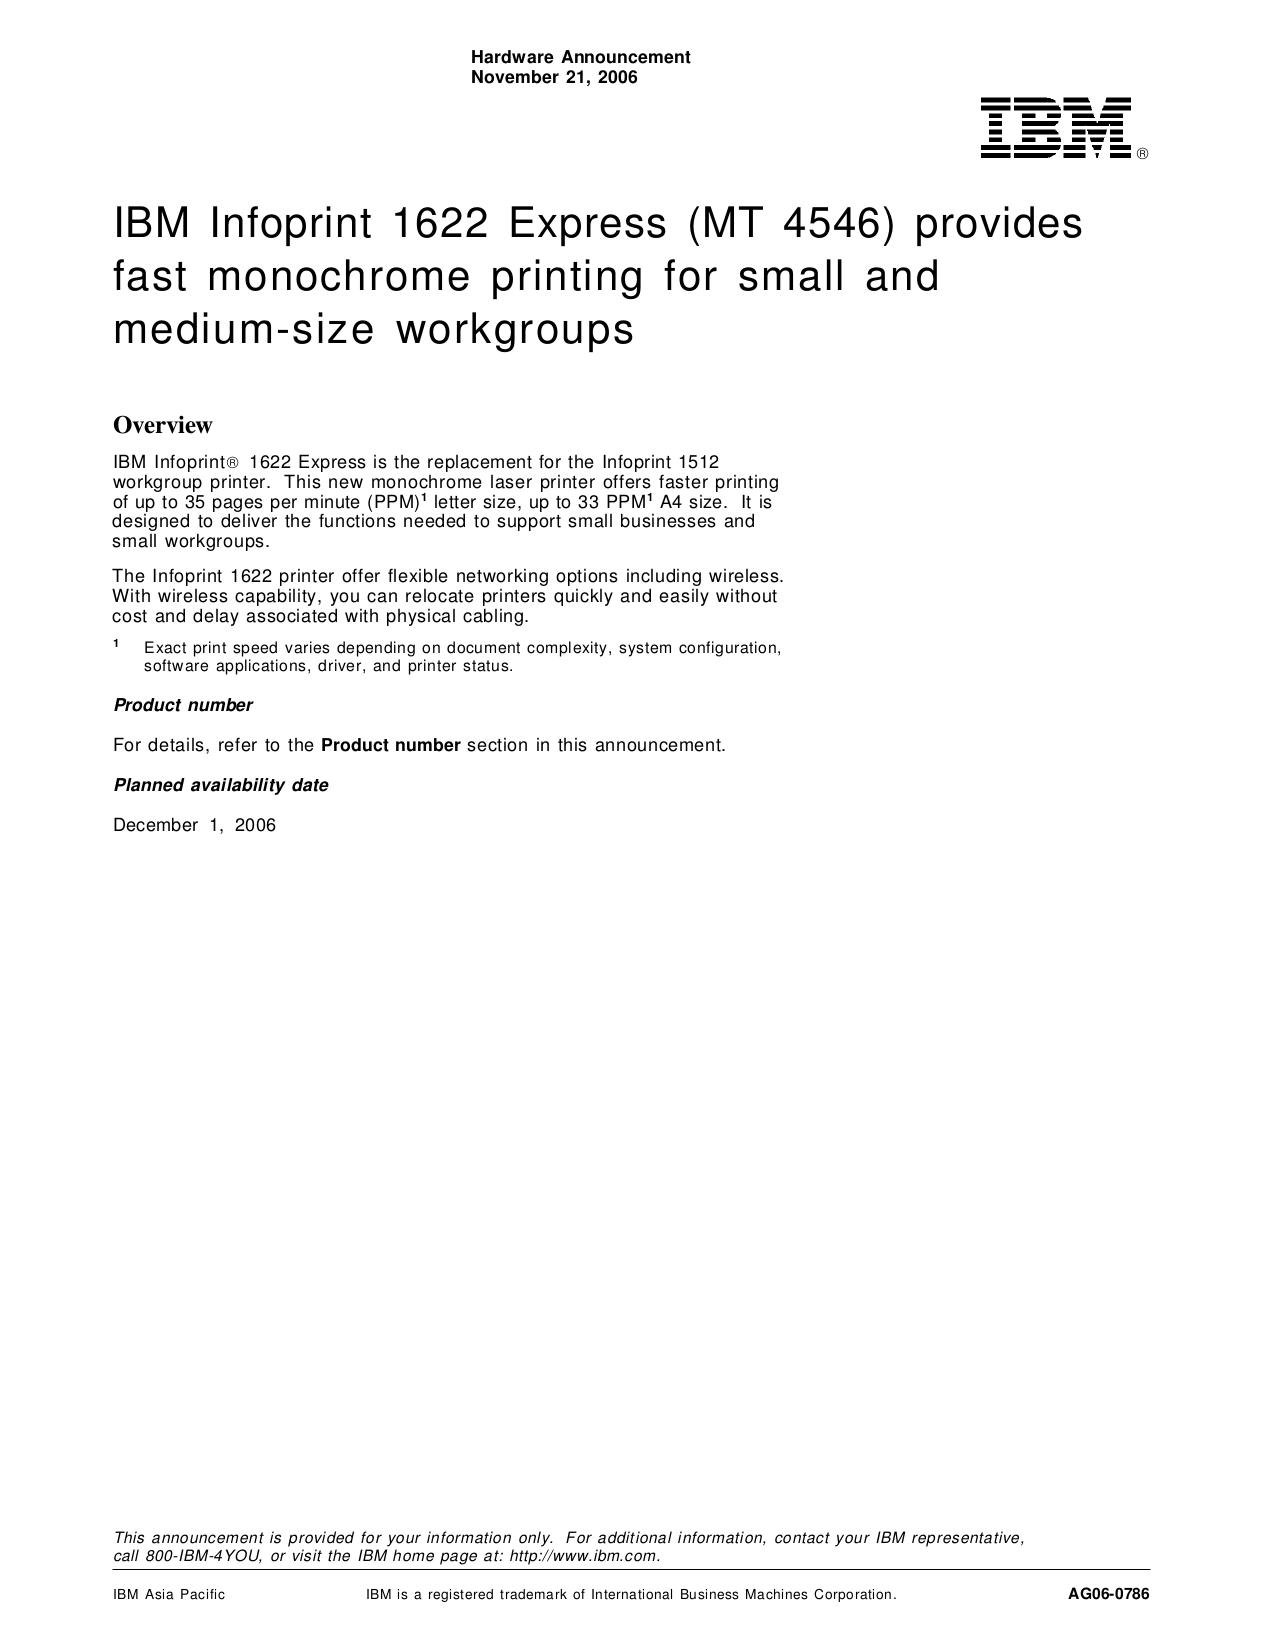 Offer letter pdf ibm